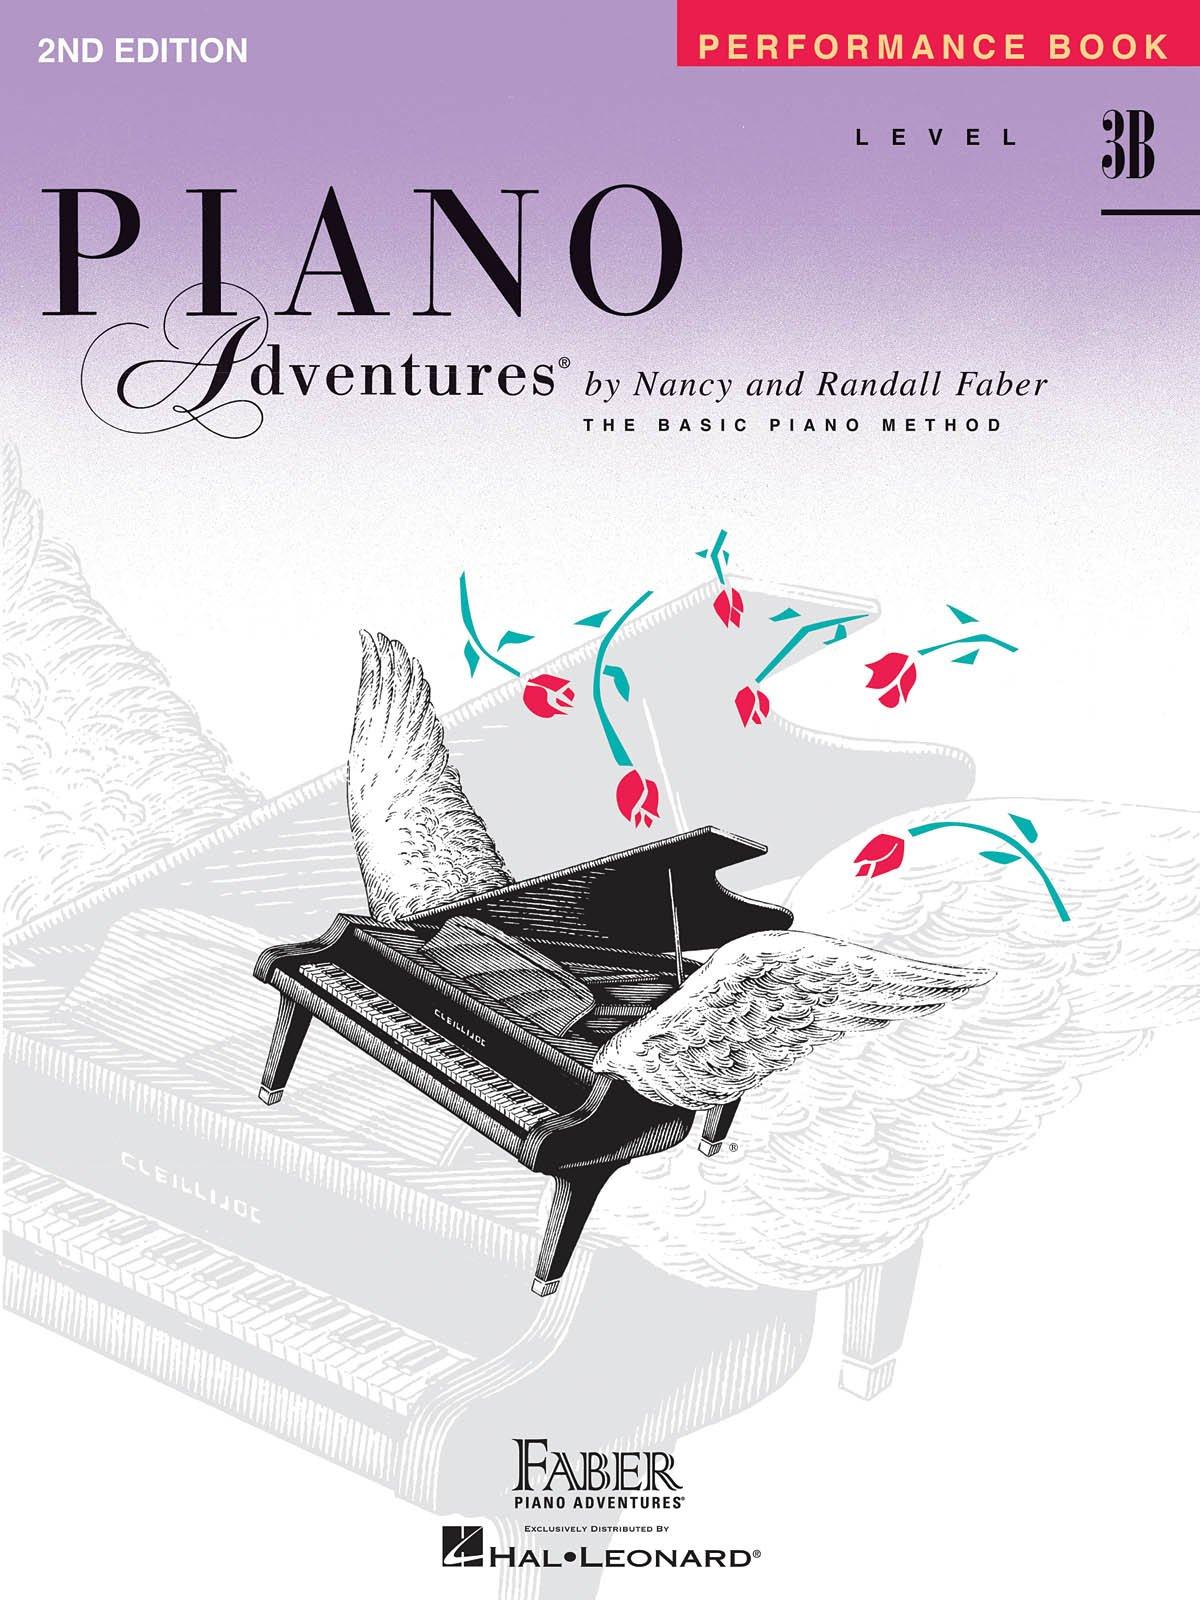 Piano Adventures Performance Book 3B